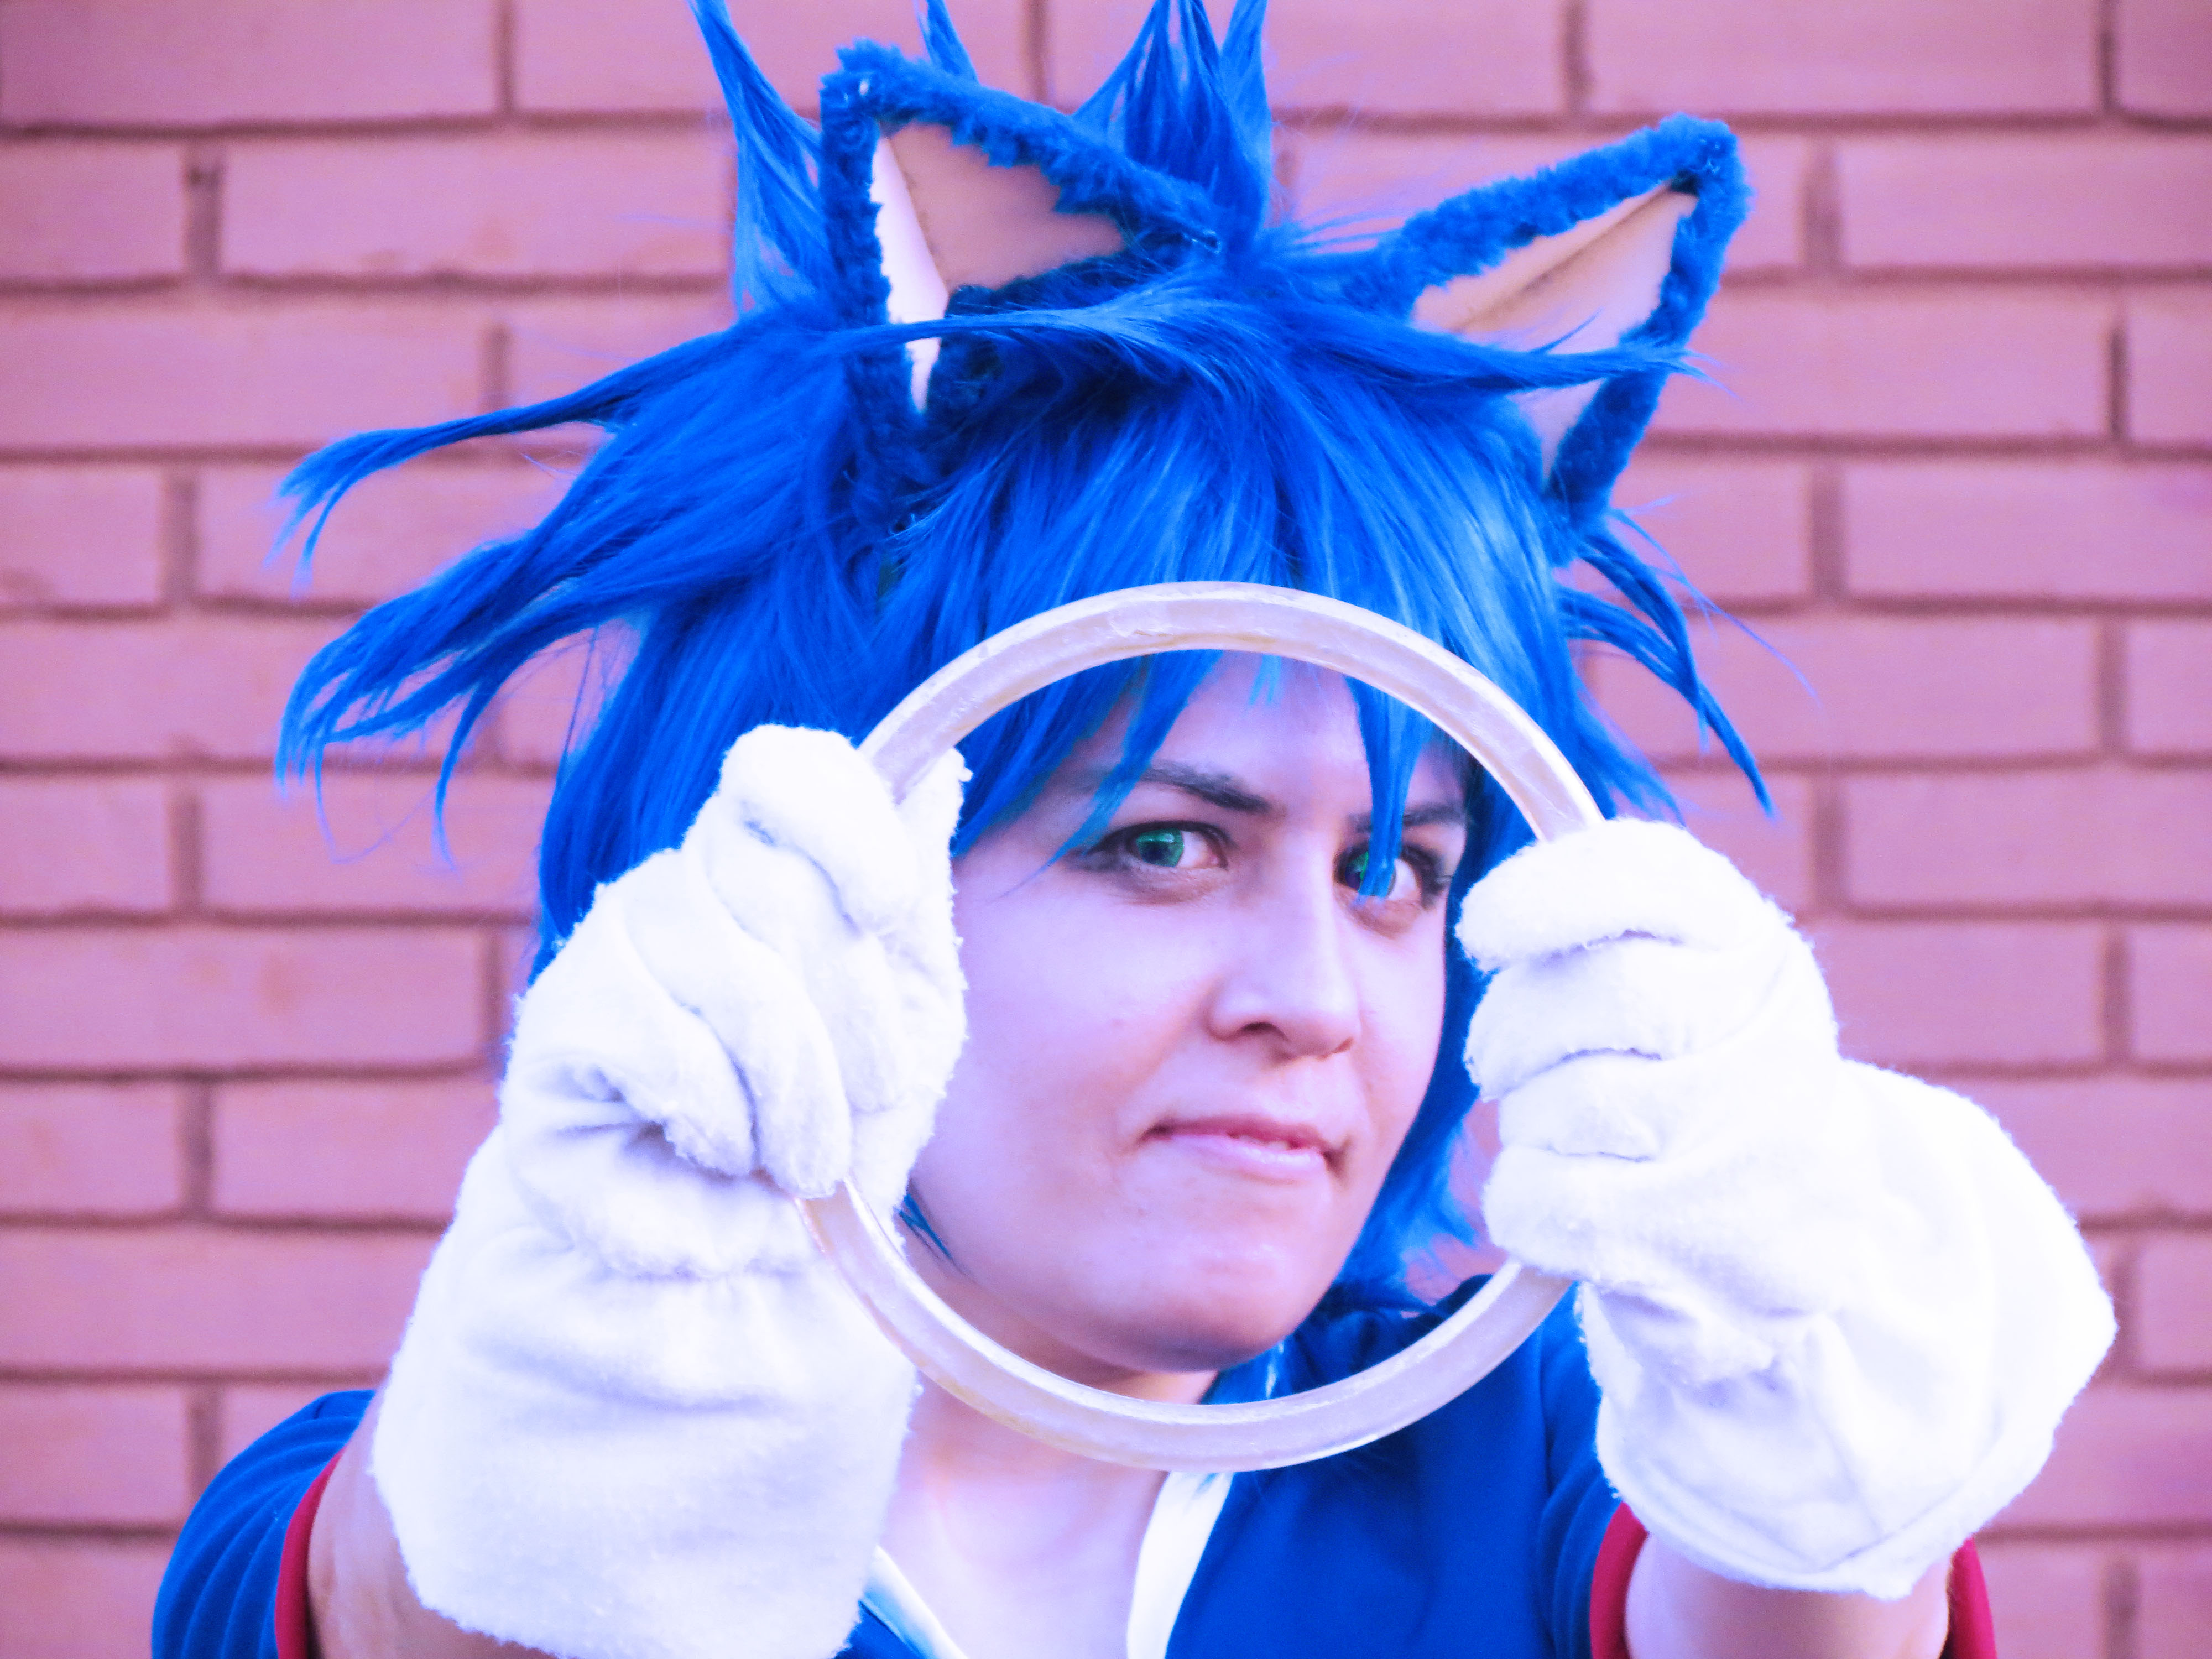 Sonic The Hedgehog Cosplay by SaoriElise